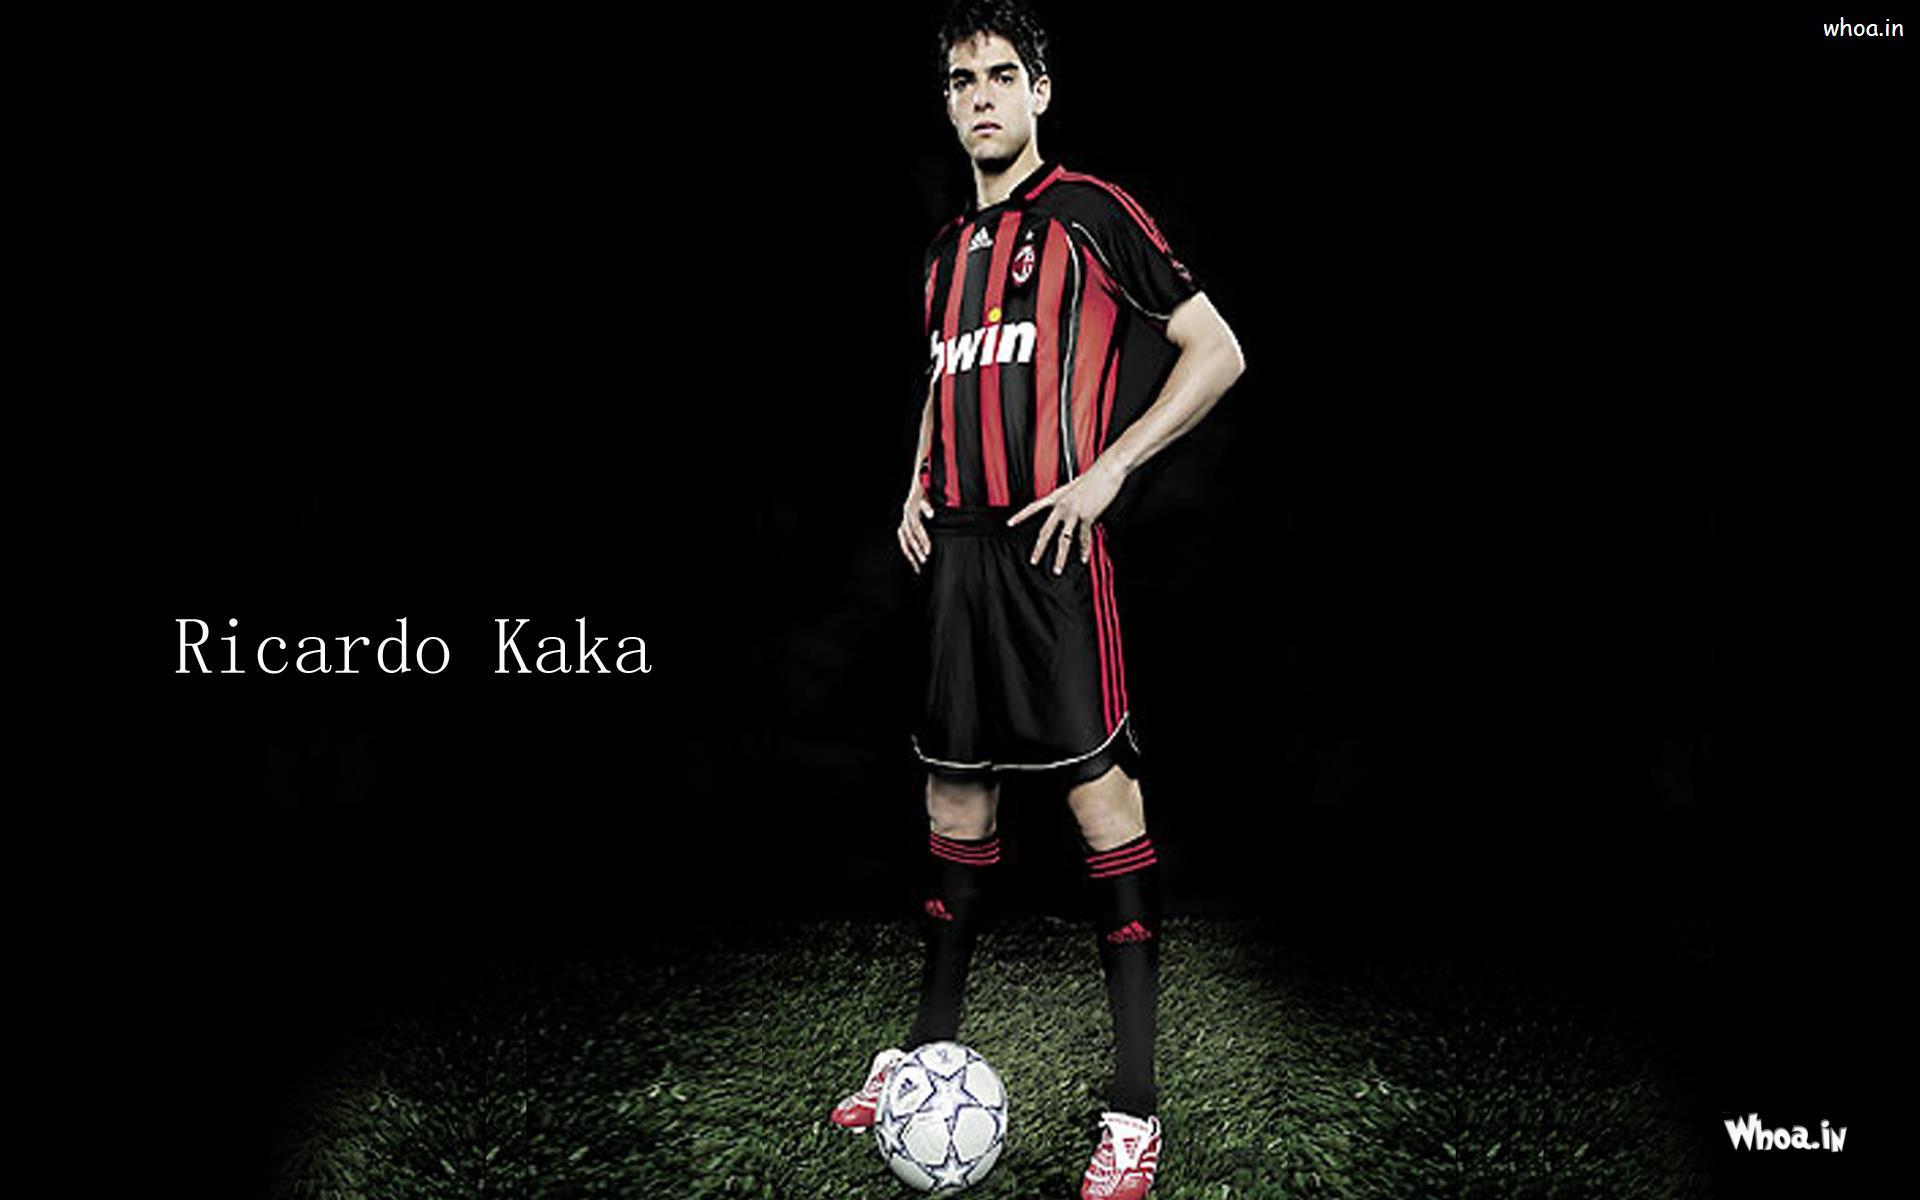 Ronaldo Kaka Football Ground Black Background 1920x1200